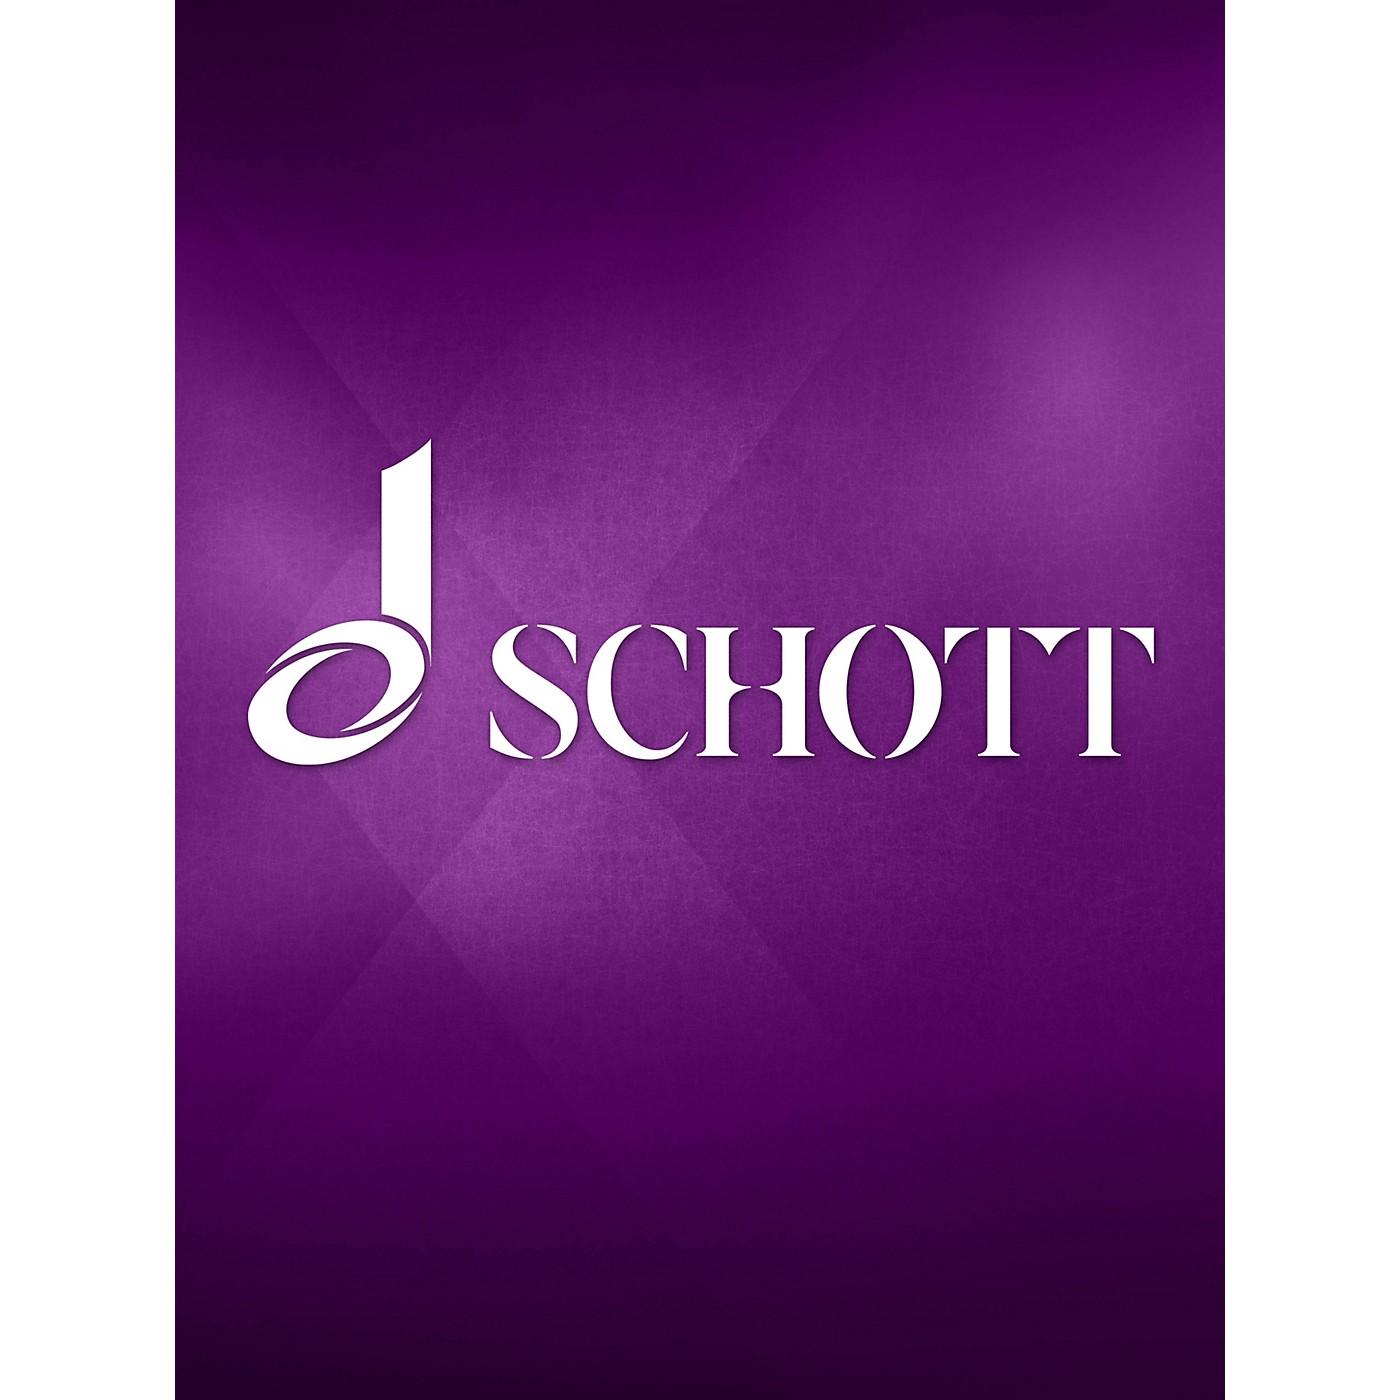 Eulenburg Concerto Grosso in F Major Op. 7, No. 12 (Cembalo Part) Schott Series by Pietro Antonio Locatelli thumbnail